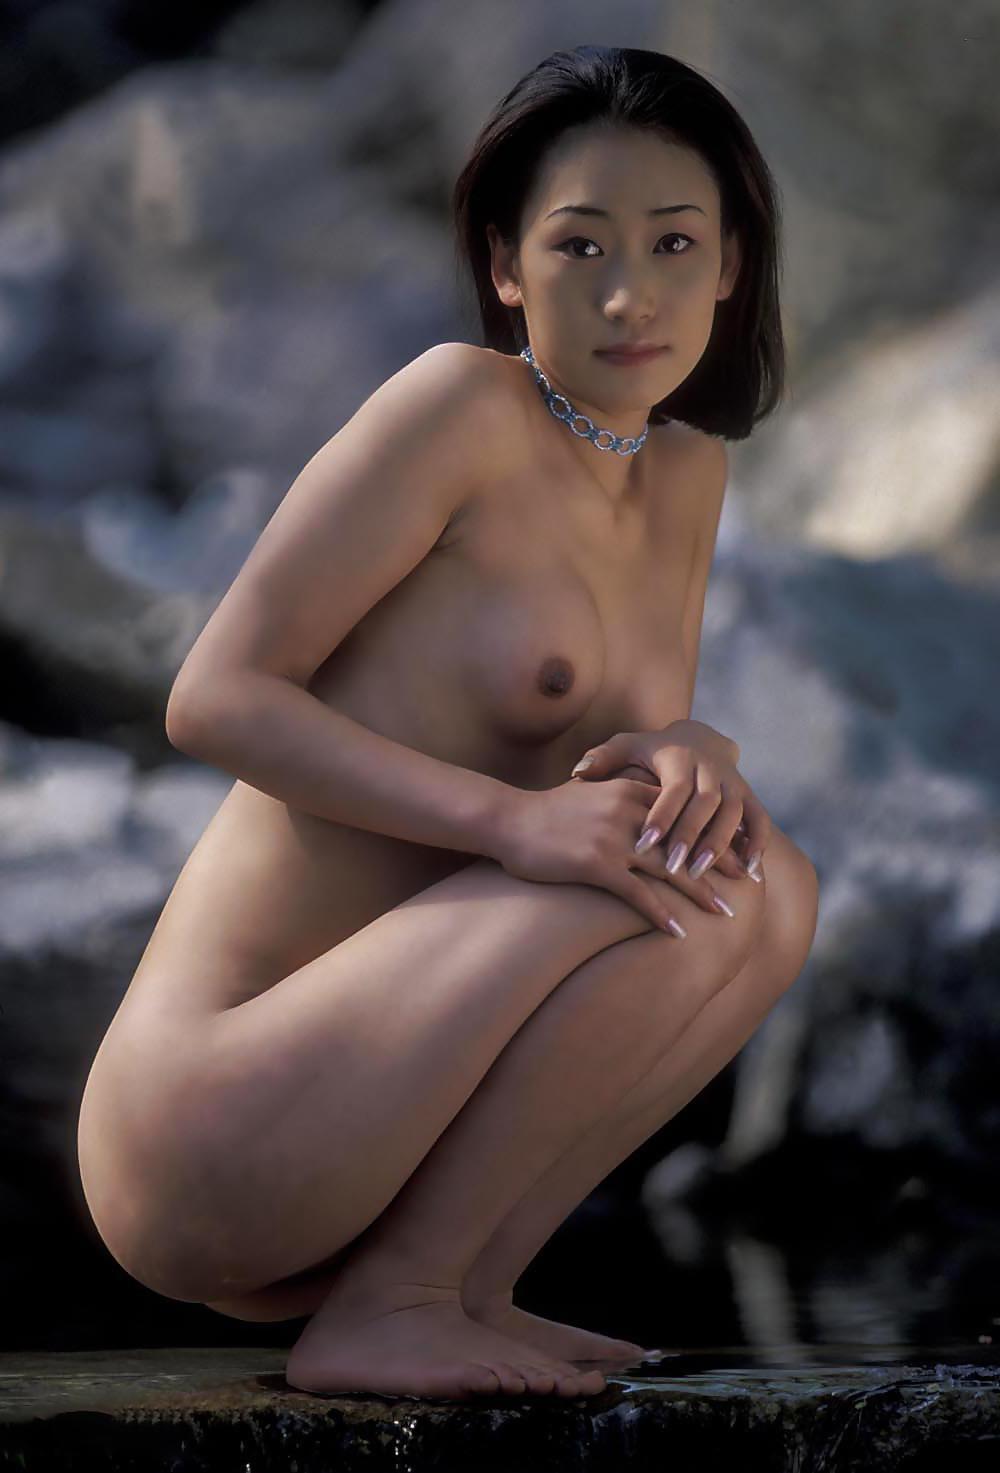 Adult Video Bikini chinese girl pic